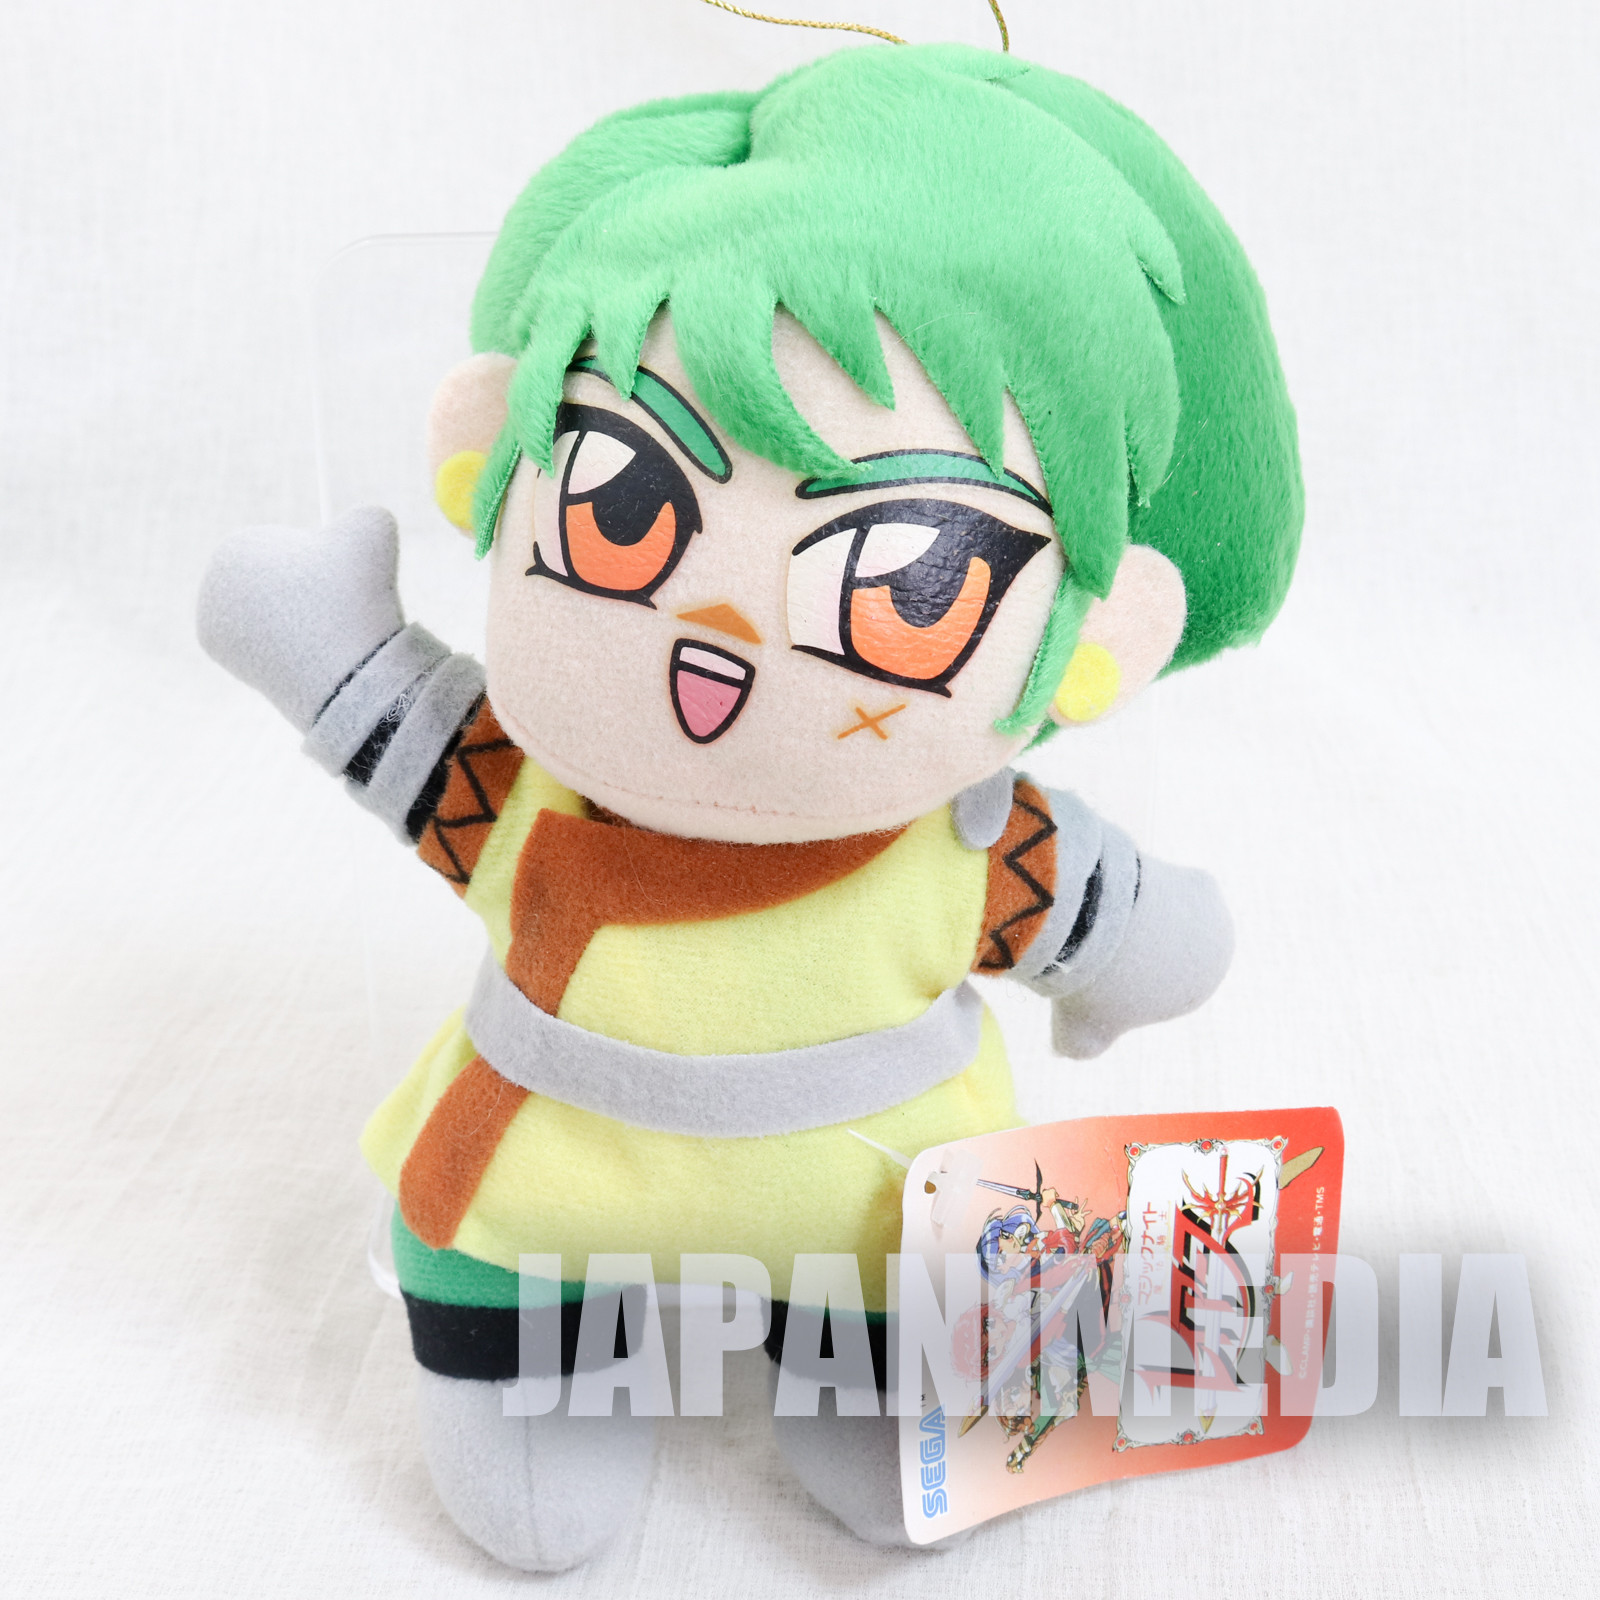 Retro Magic Knight Rayearth Ferio Plush Doll SEGA CLAMP JAPAN